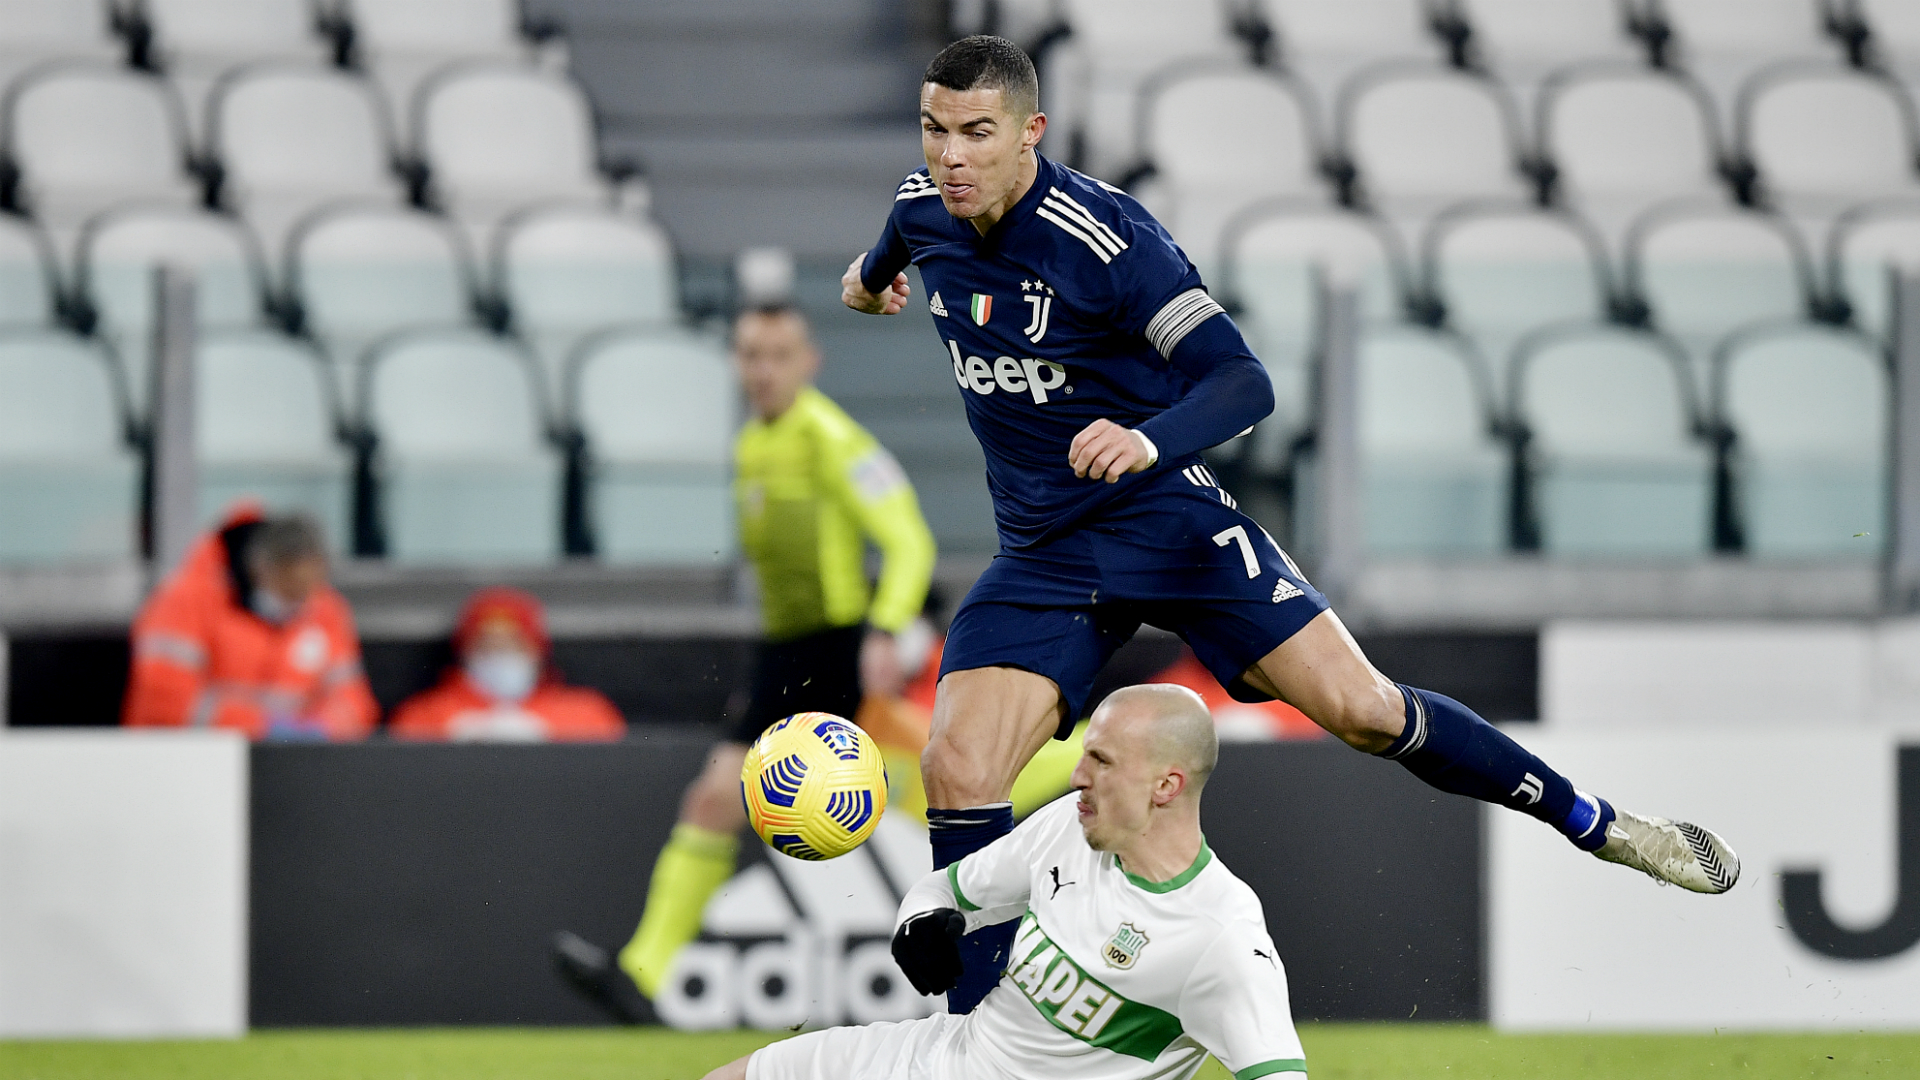 Juventus 3-1 Sassuolo: Ronaldo puts gloss on Serie A victory over 10 men